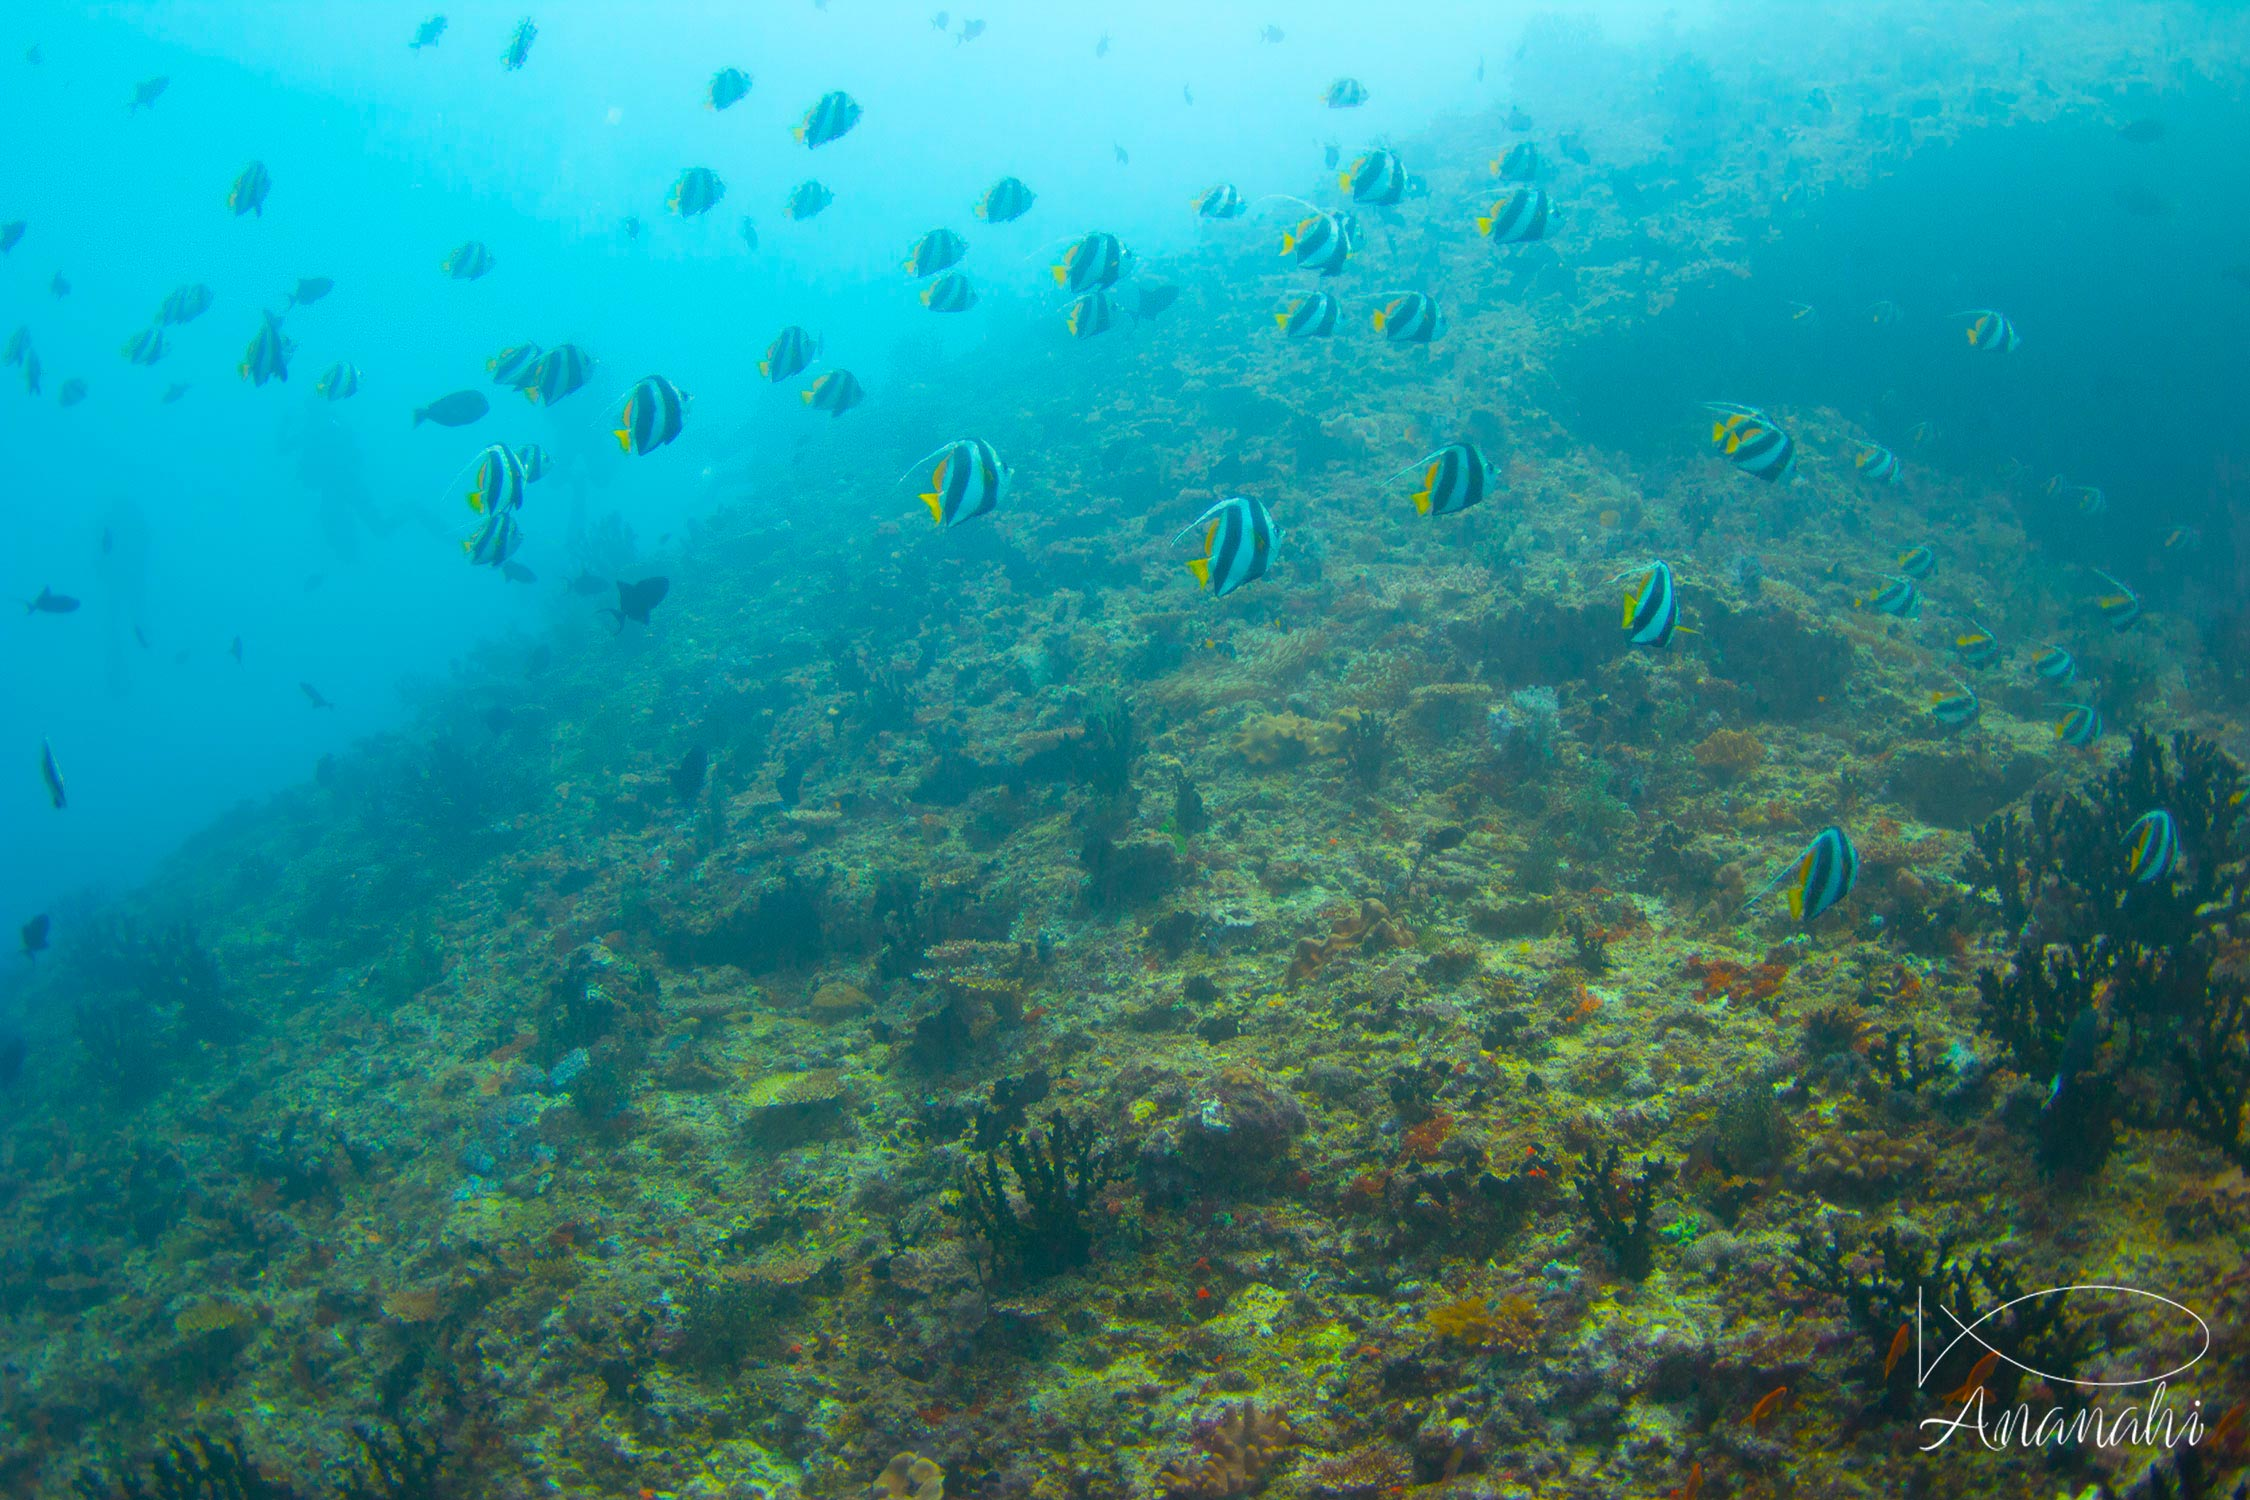 Schooling bannerfish of Maldives